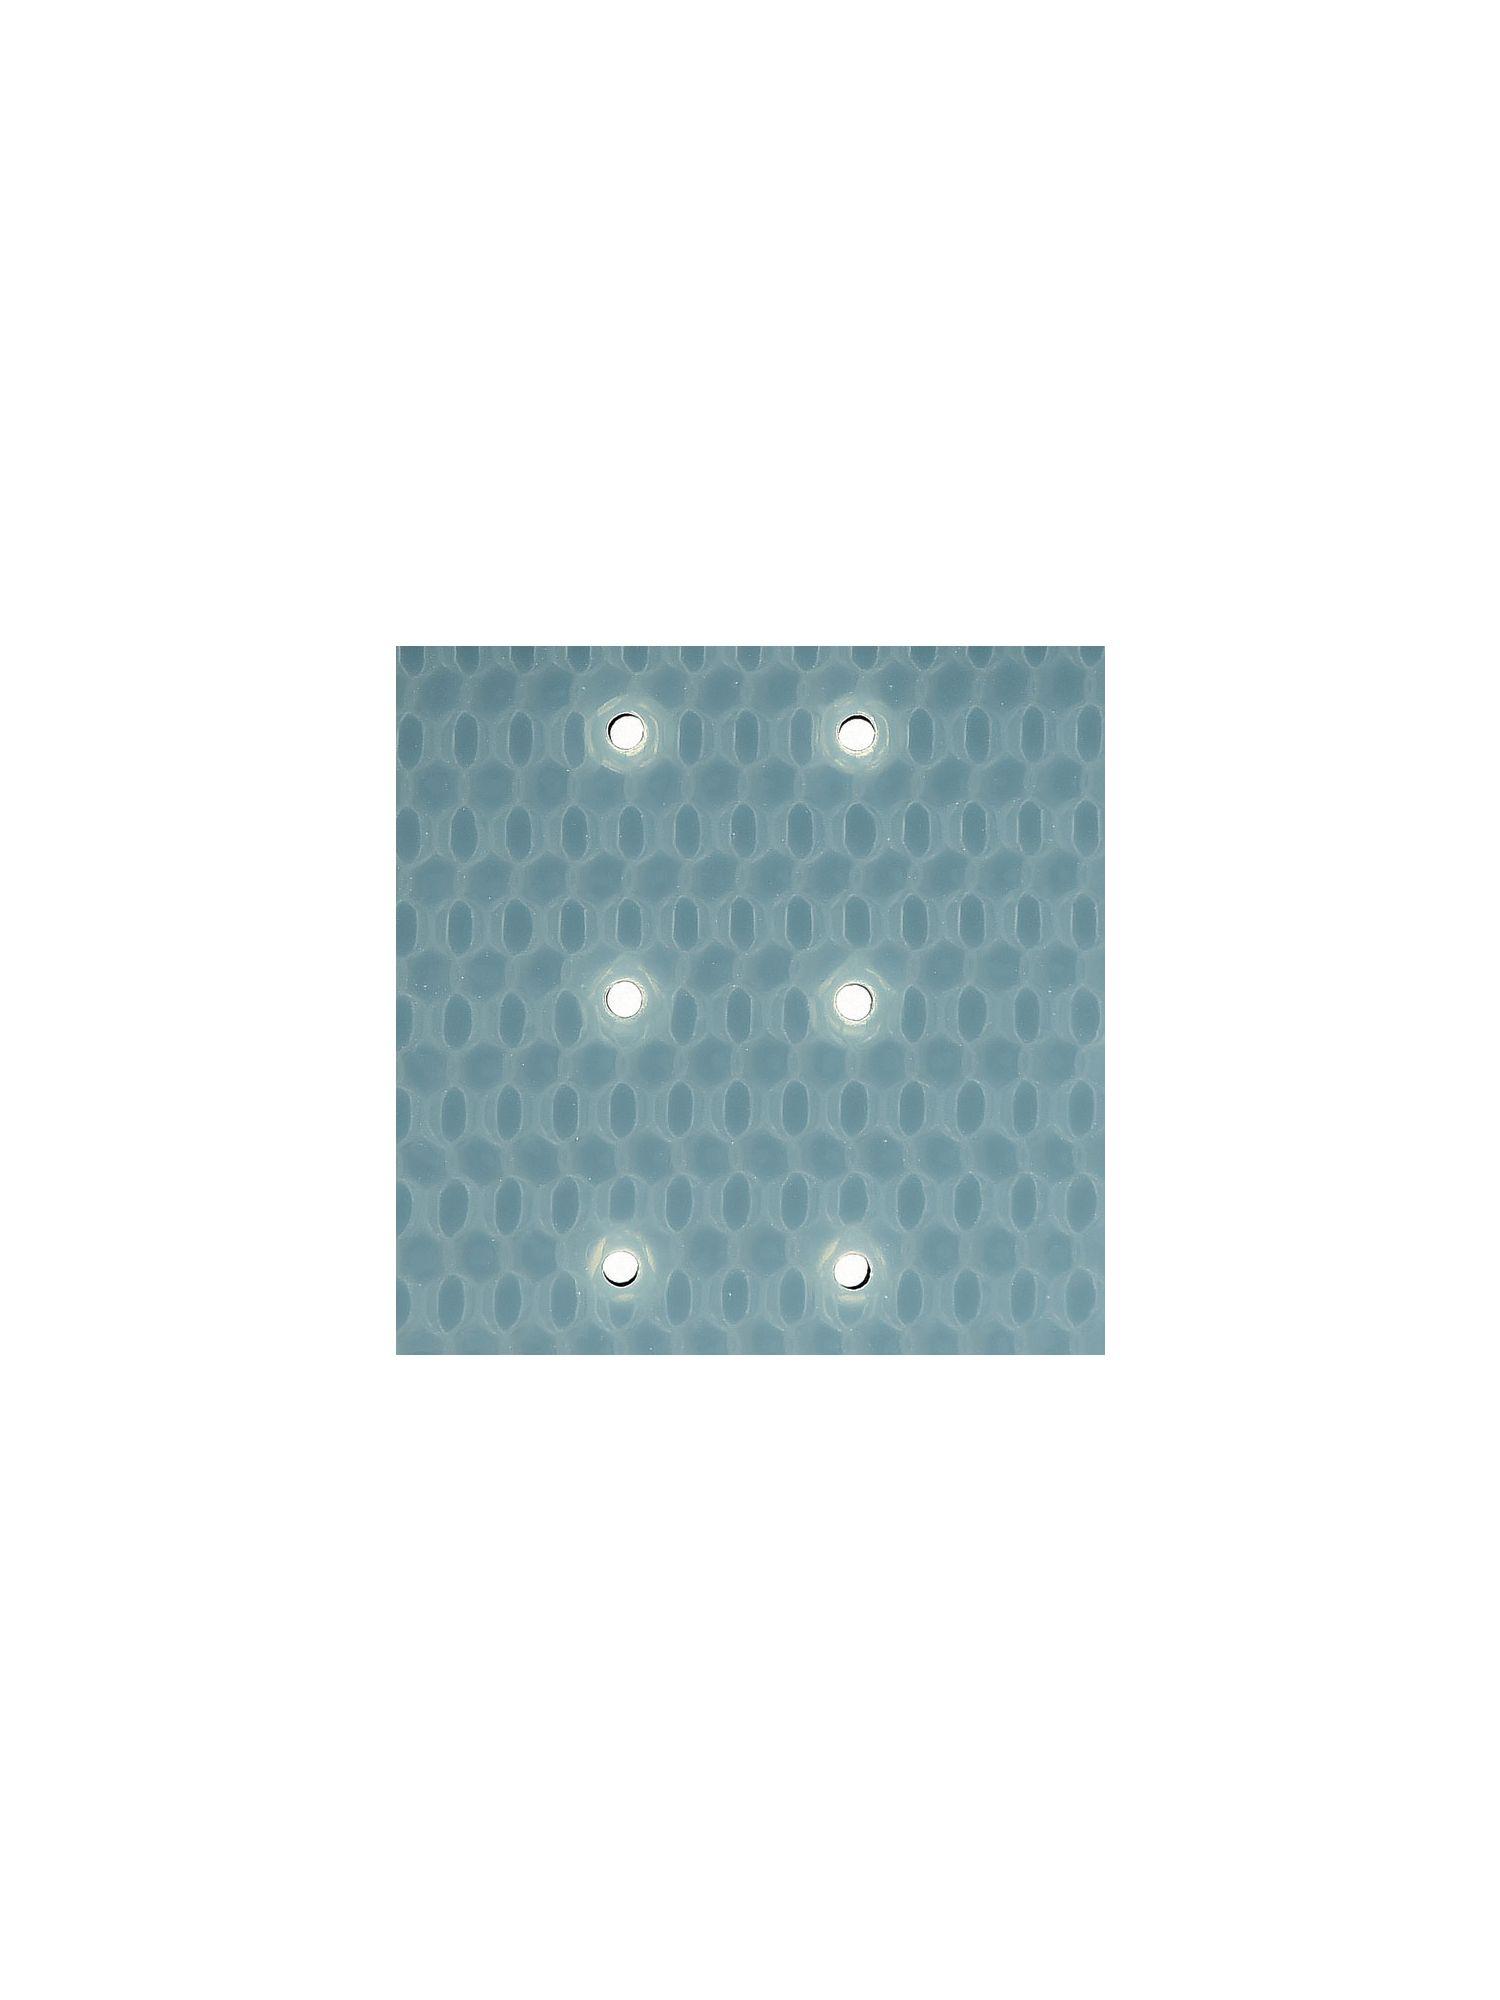 TRV063 | TECCELL チェストプロテクター(ボタンタイプ)【MEN'S】[1color]